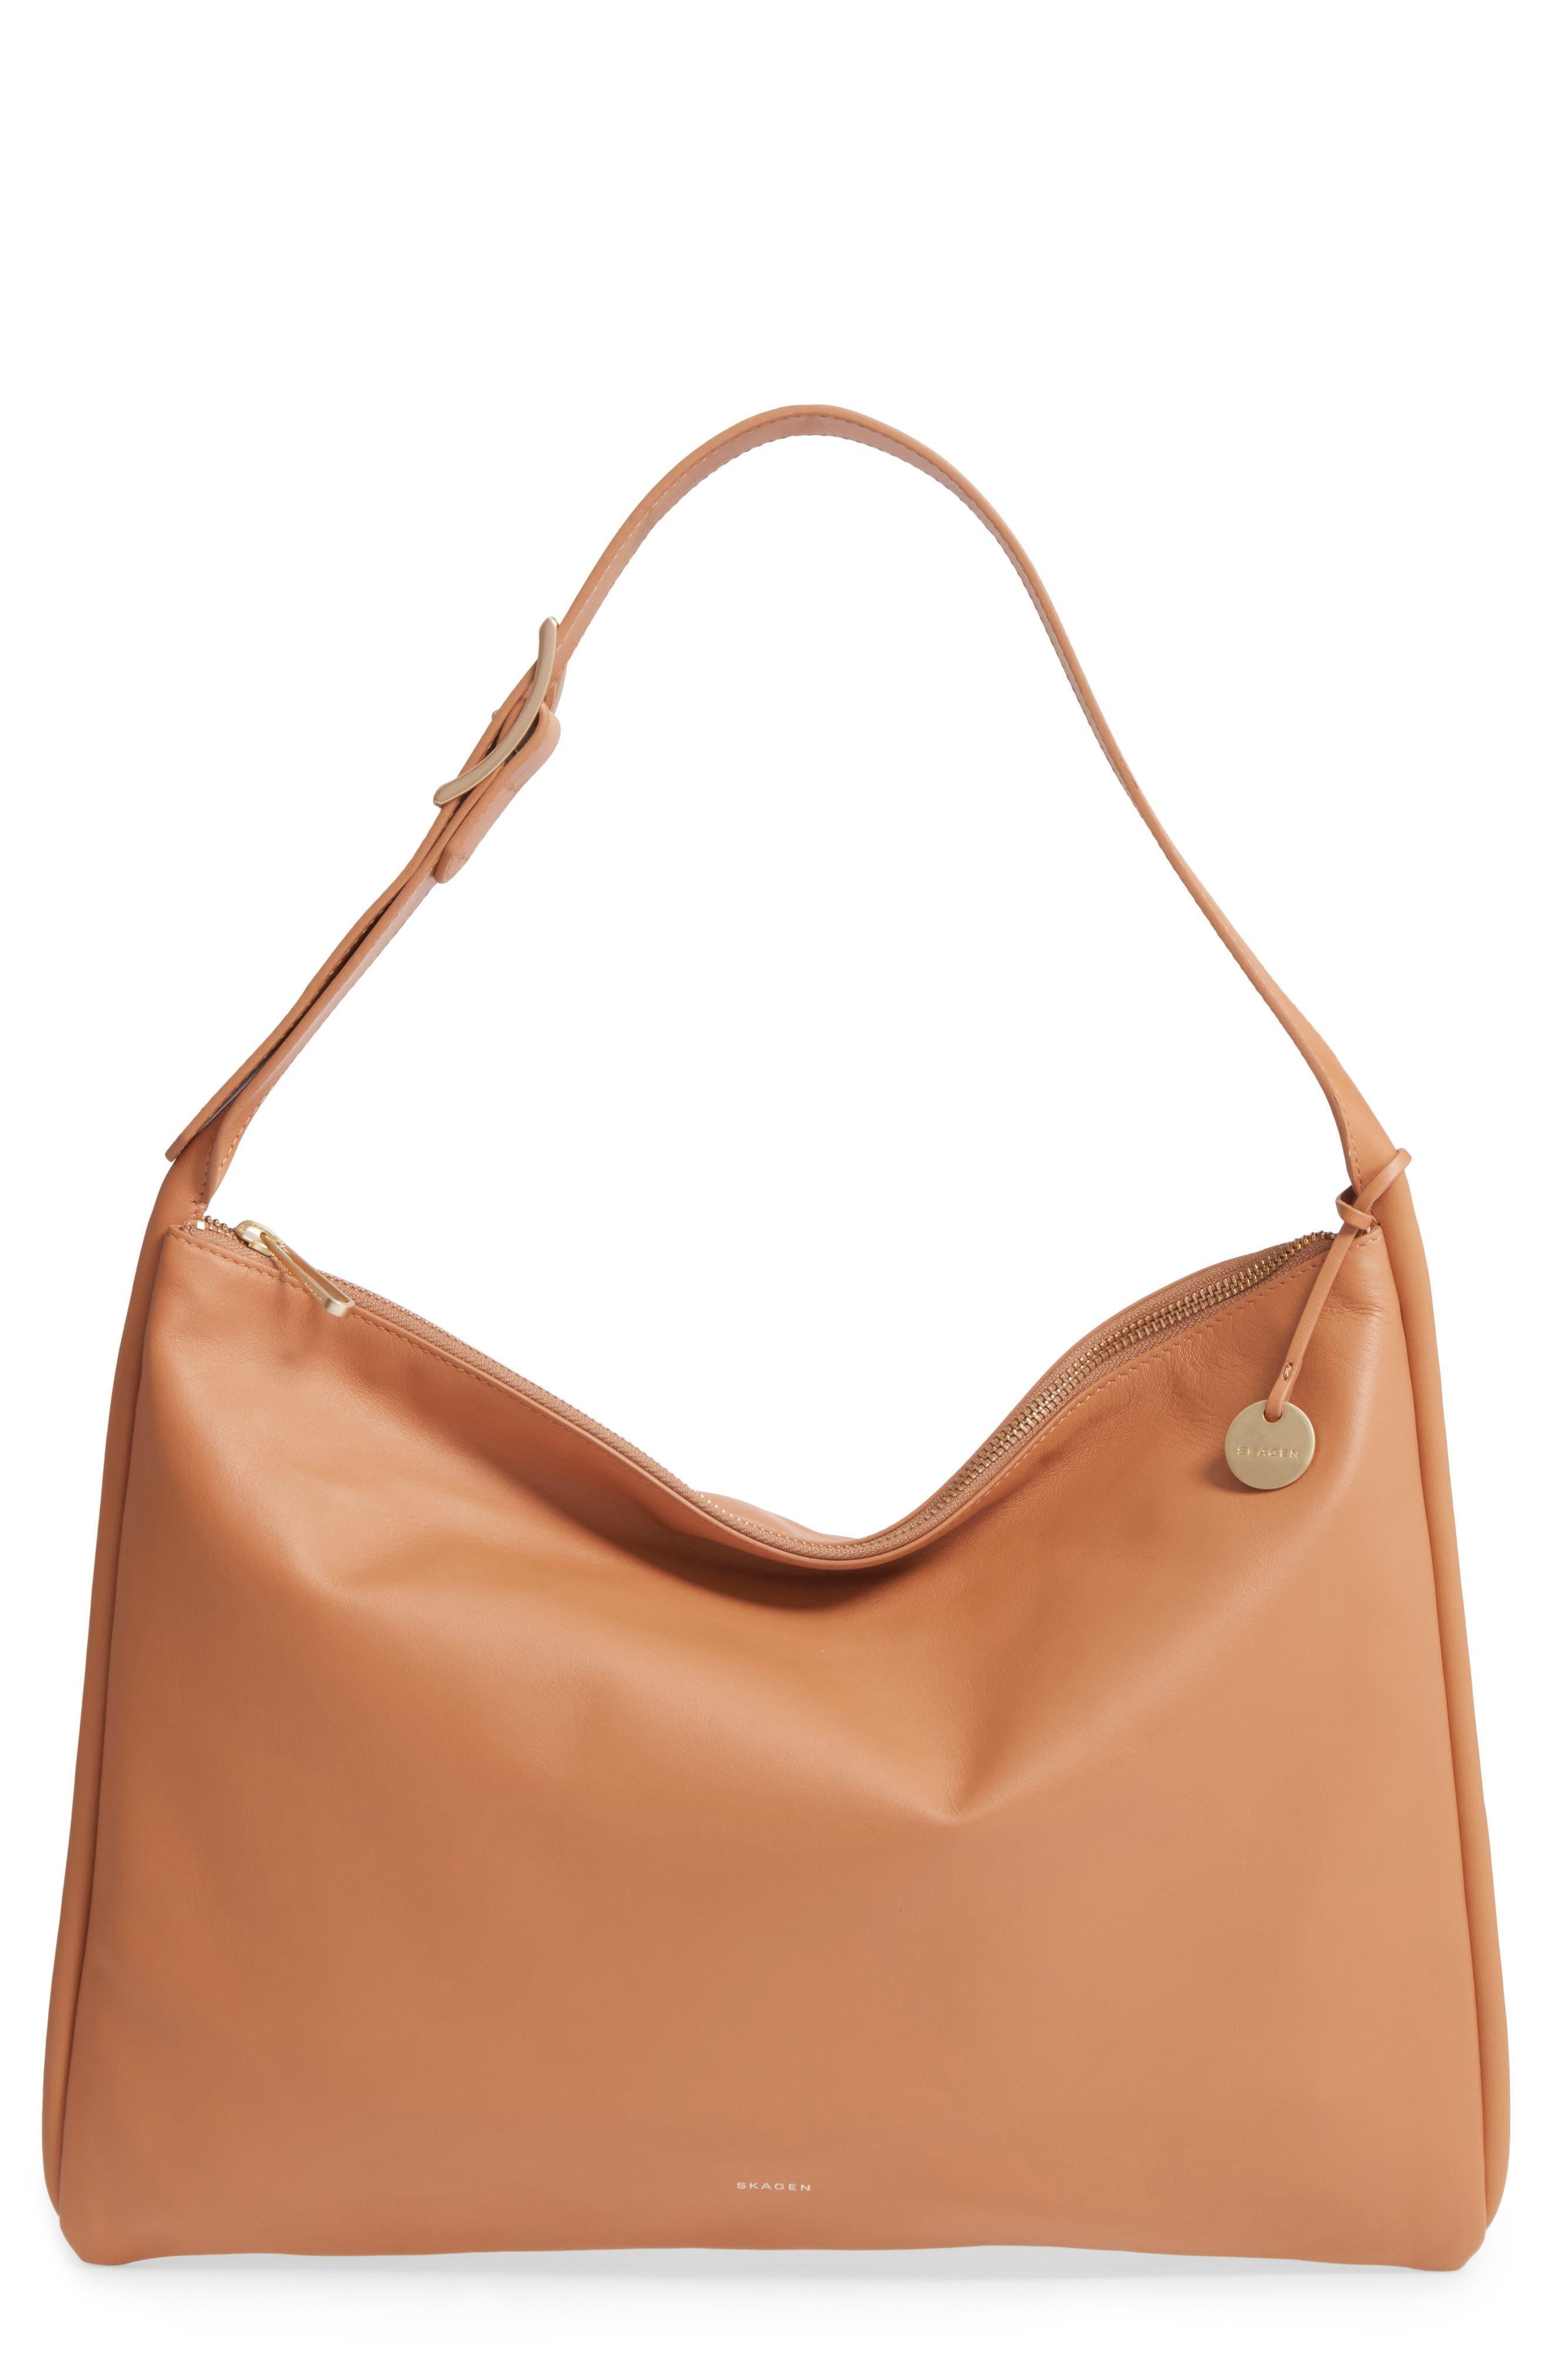 Anesa Leather Shoulder Bag,                         Main,                         color, Tan